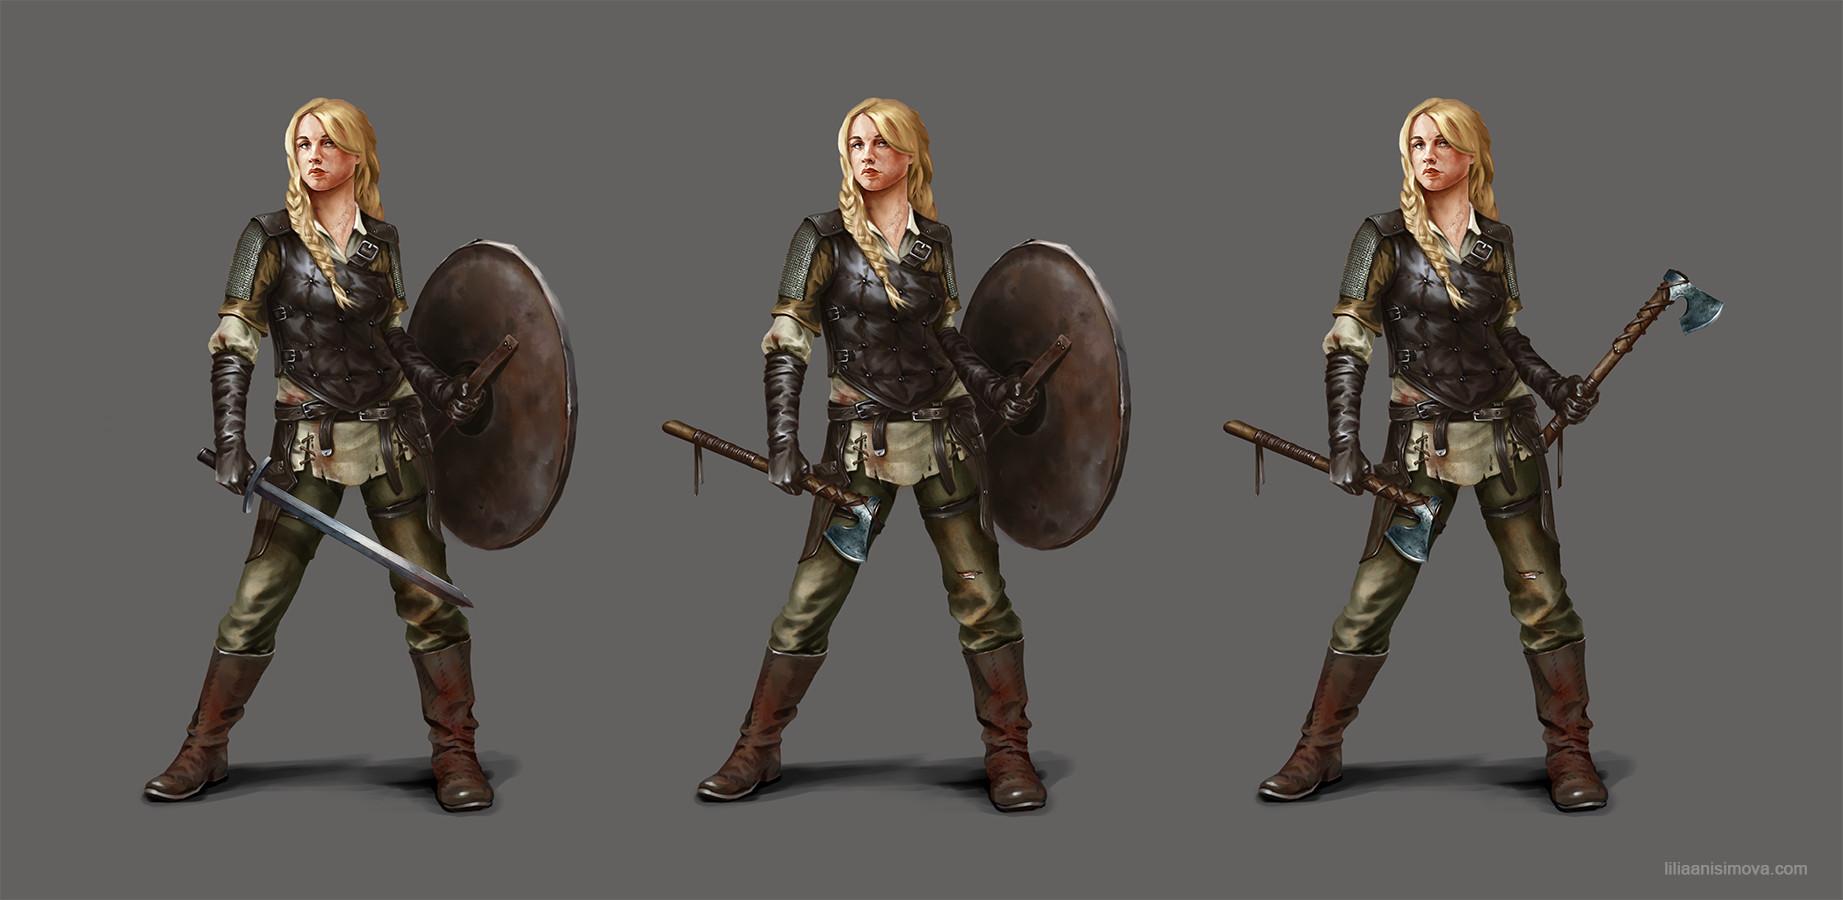 Artstation Shieldmaiden Concept Lilia Anisimova